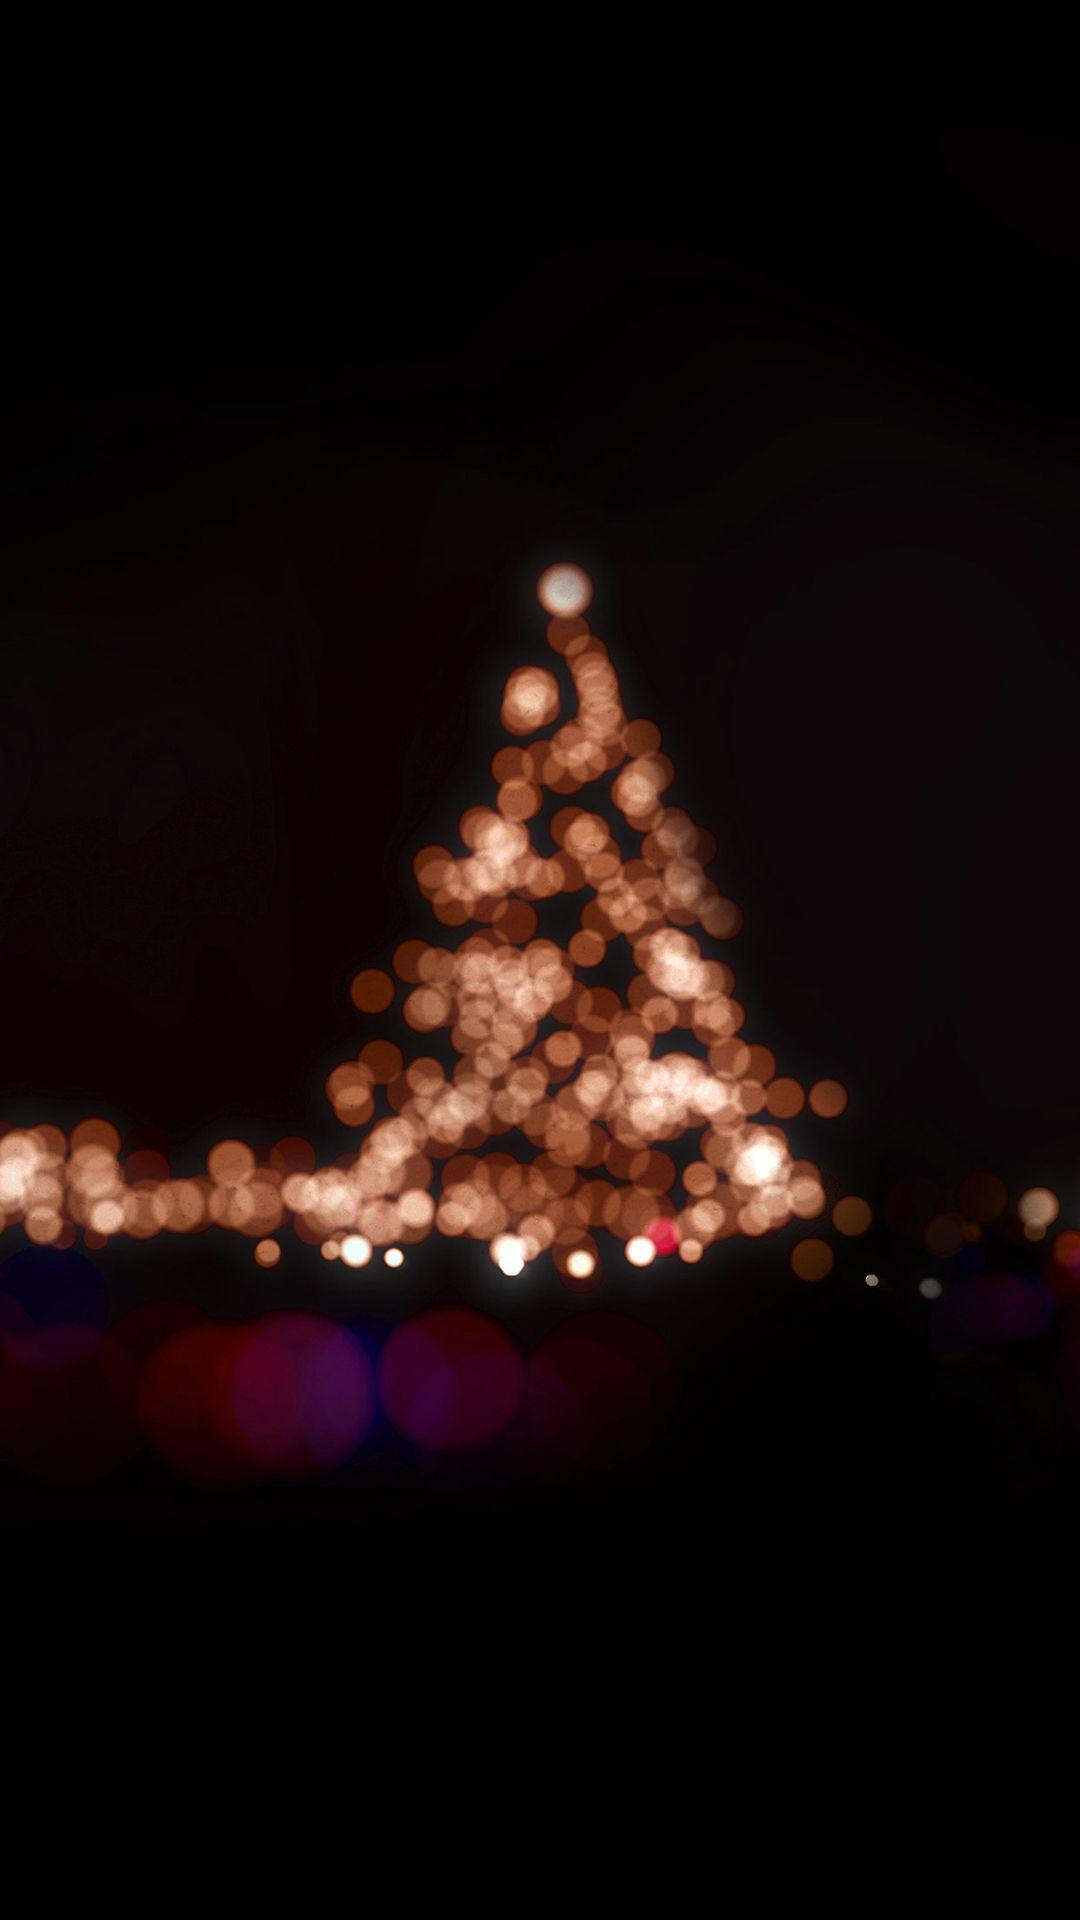 Christmas Lights Bokeh Love Dark Night Iphone 8 Wallpapers